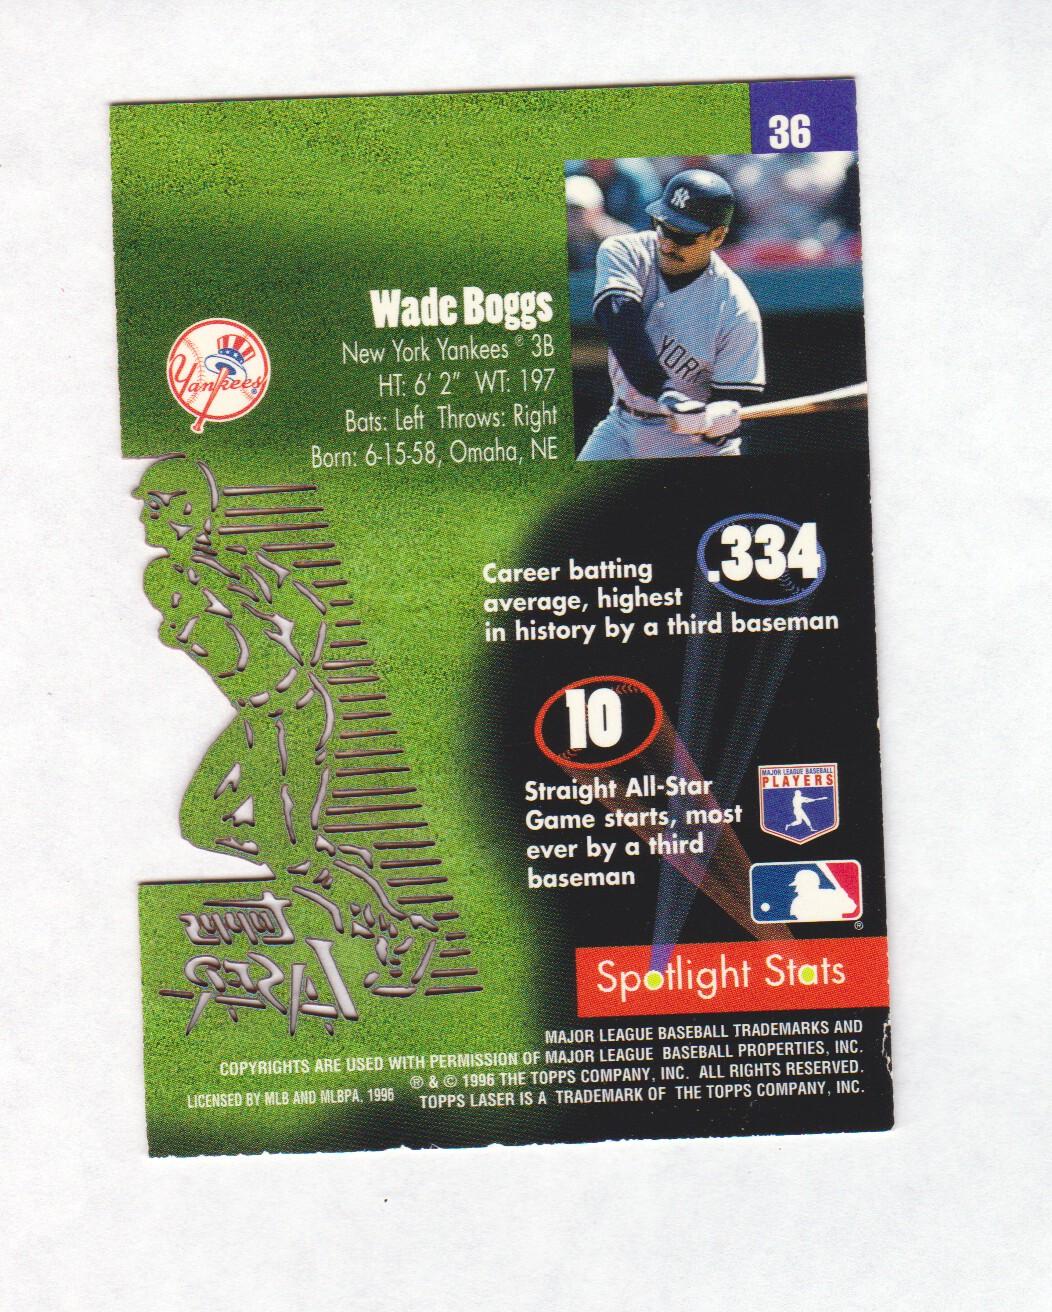 1996 Topps Laser #36 Wade Boggs back image